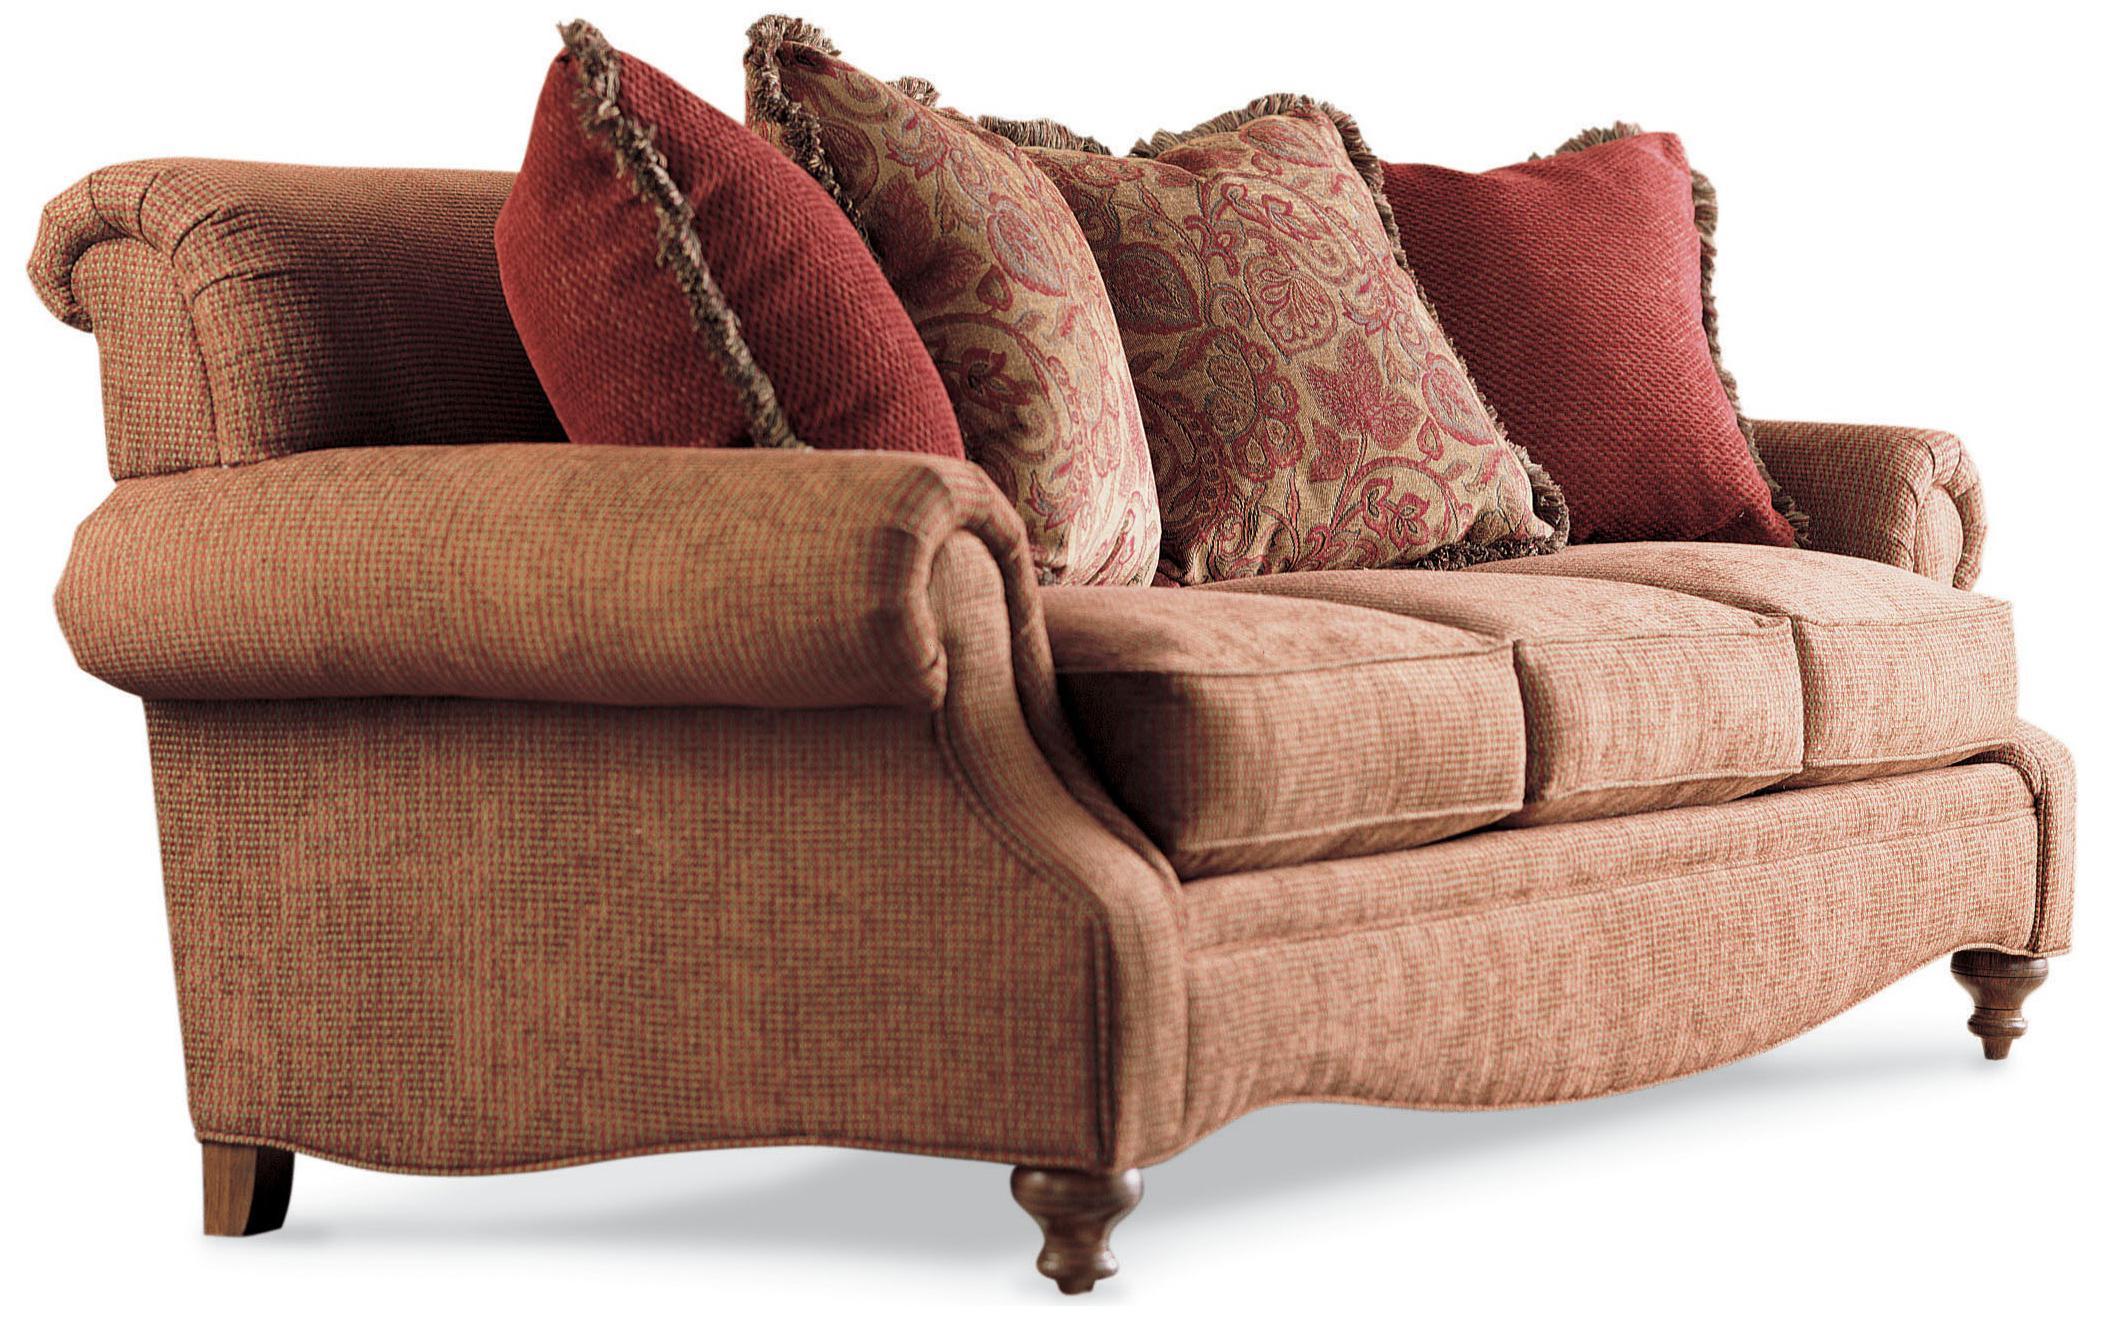 Drexel Drexel Heritage UpholsteryKerry Sofa ...